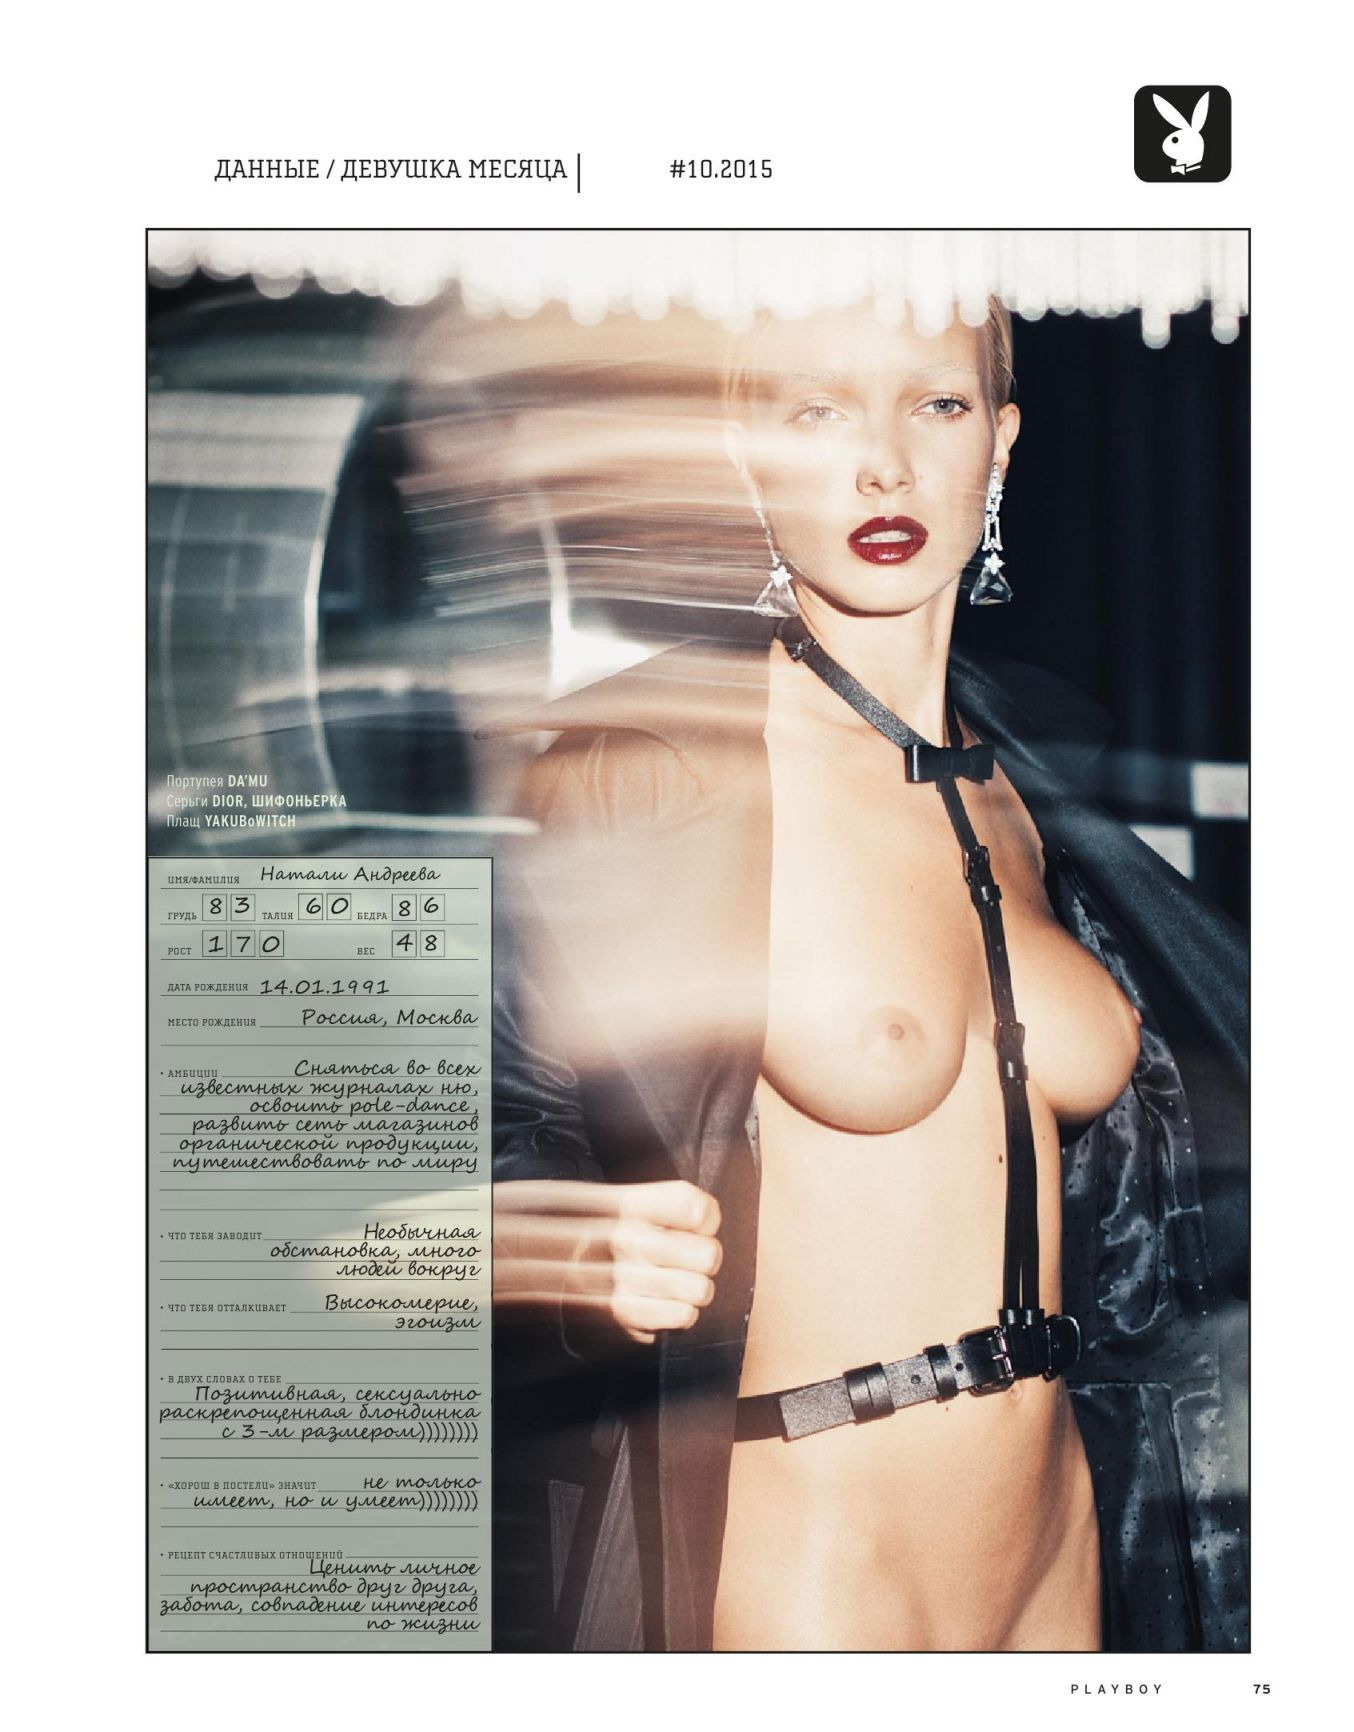 Natalie Andreeva Nude Pho...